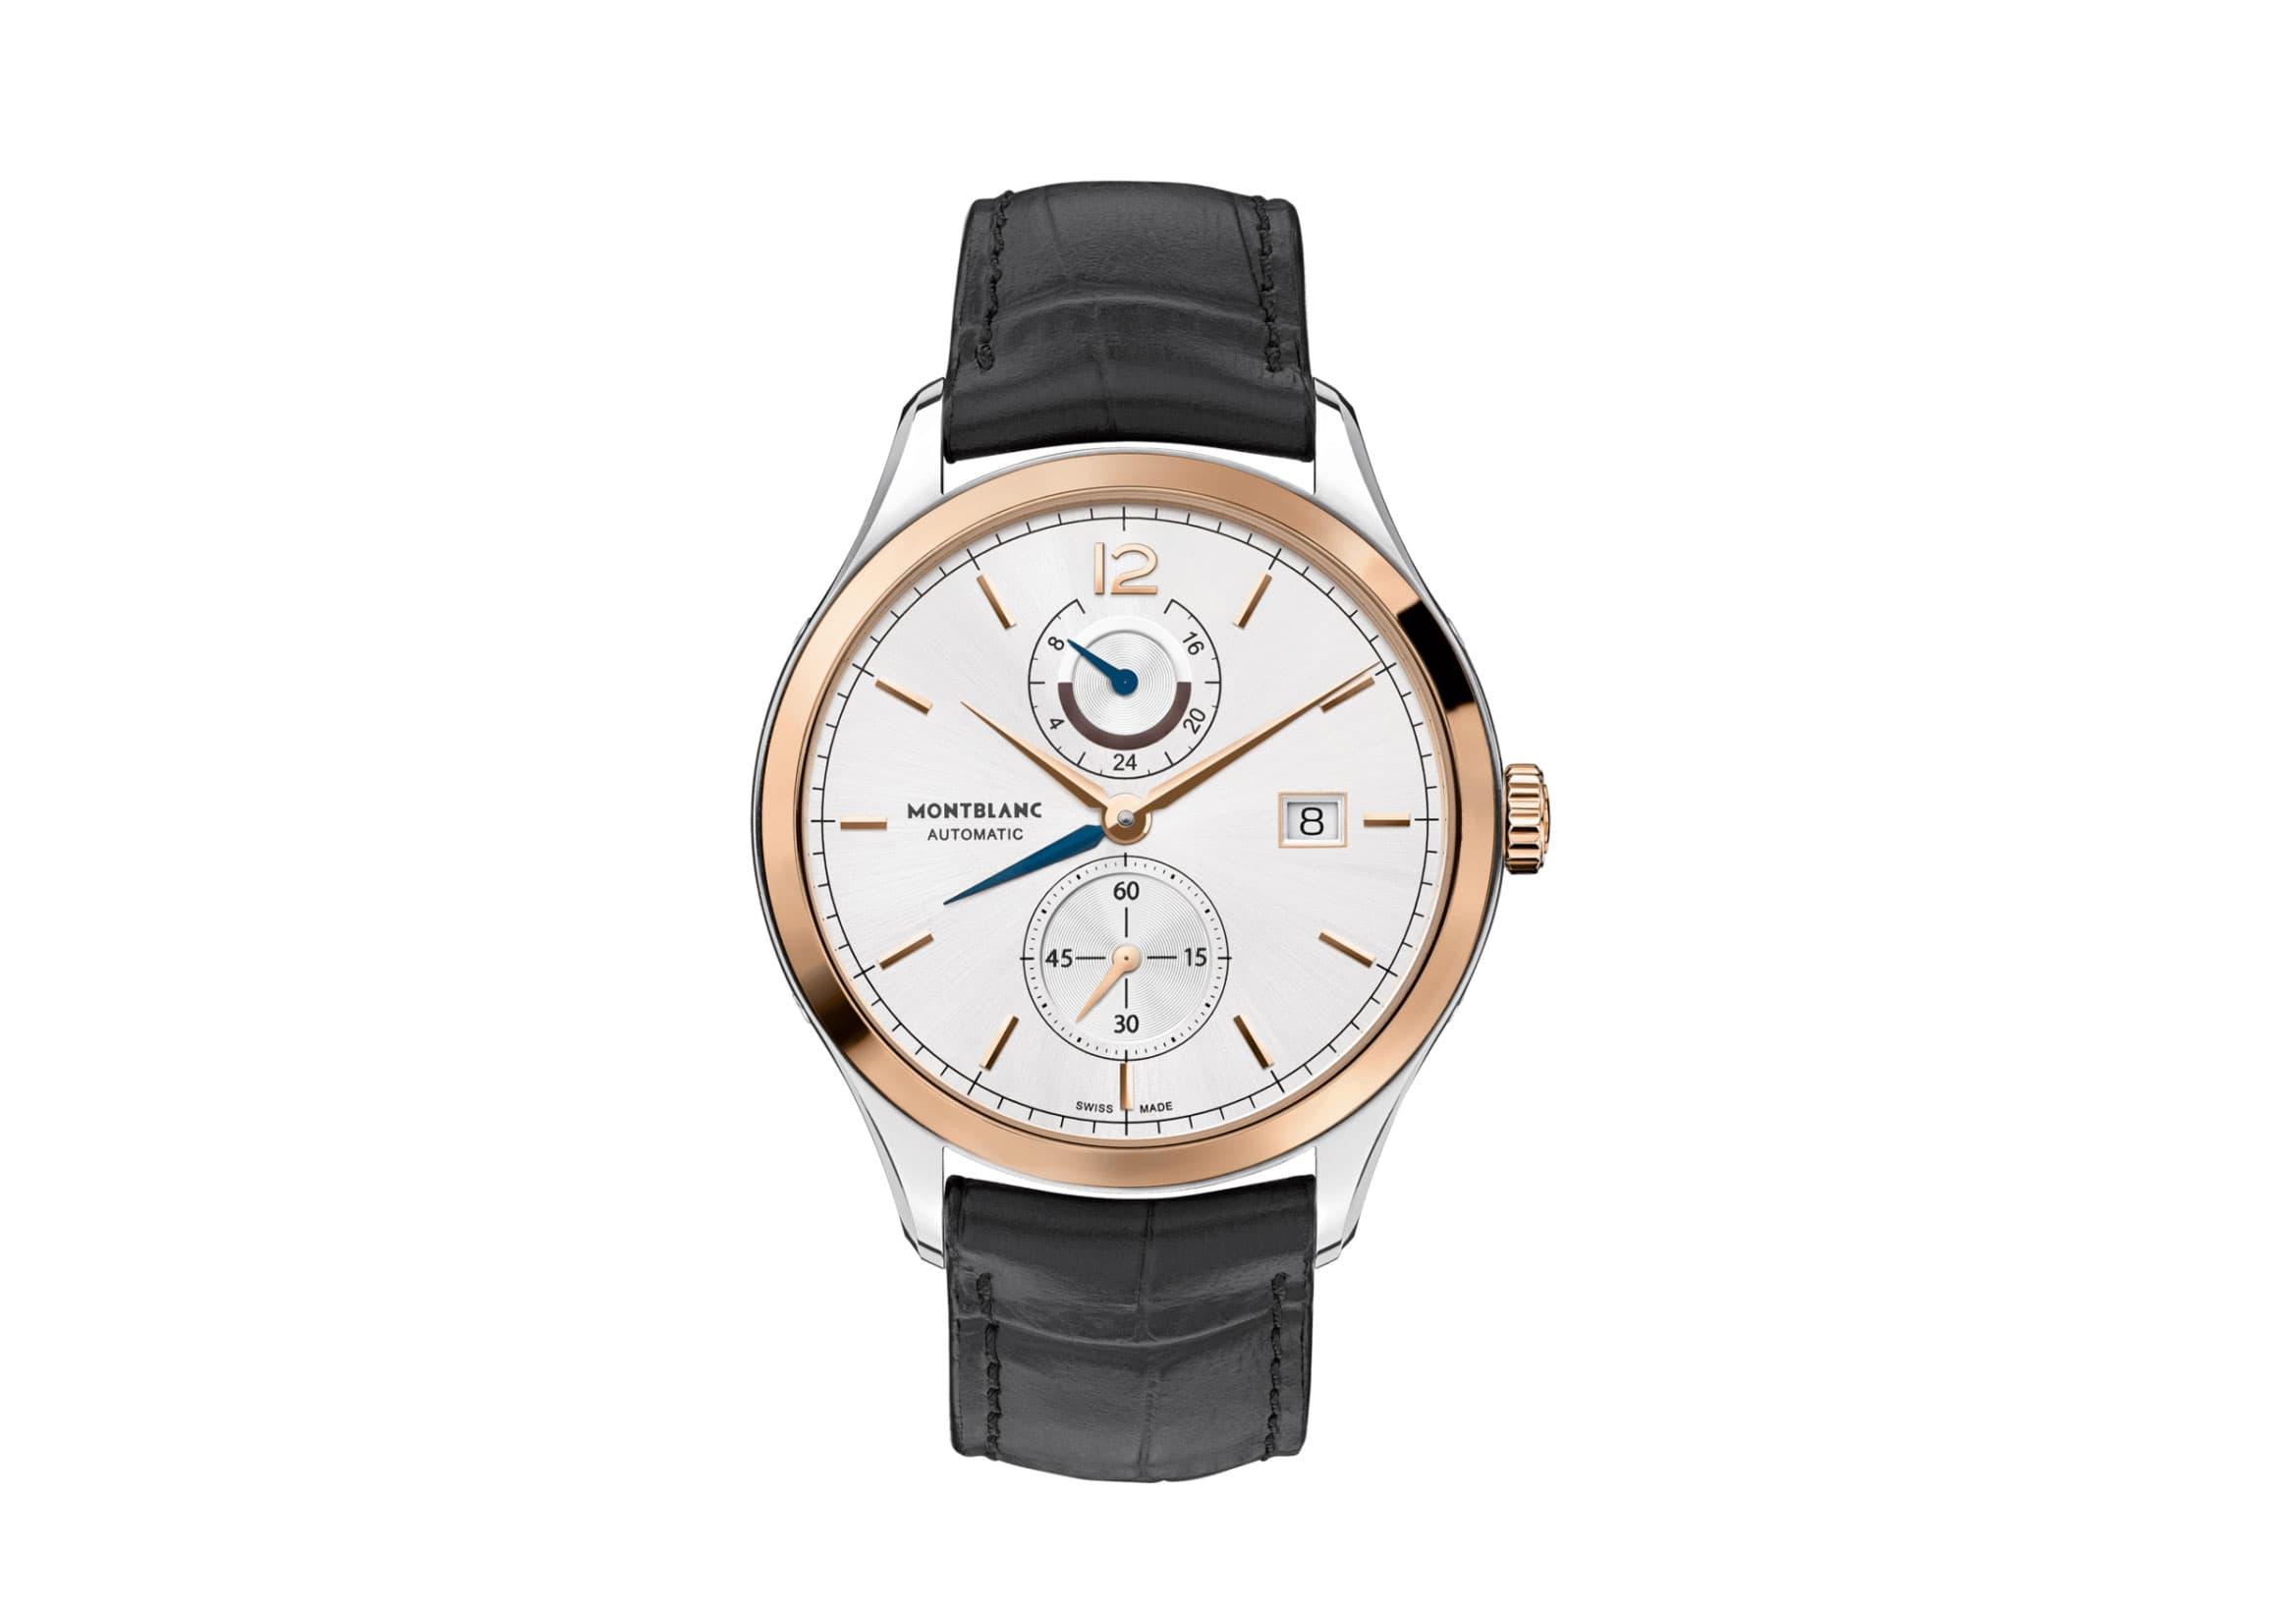 Montblanc Heritage Chronométrie Dual Time Watch with Golden Bezel